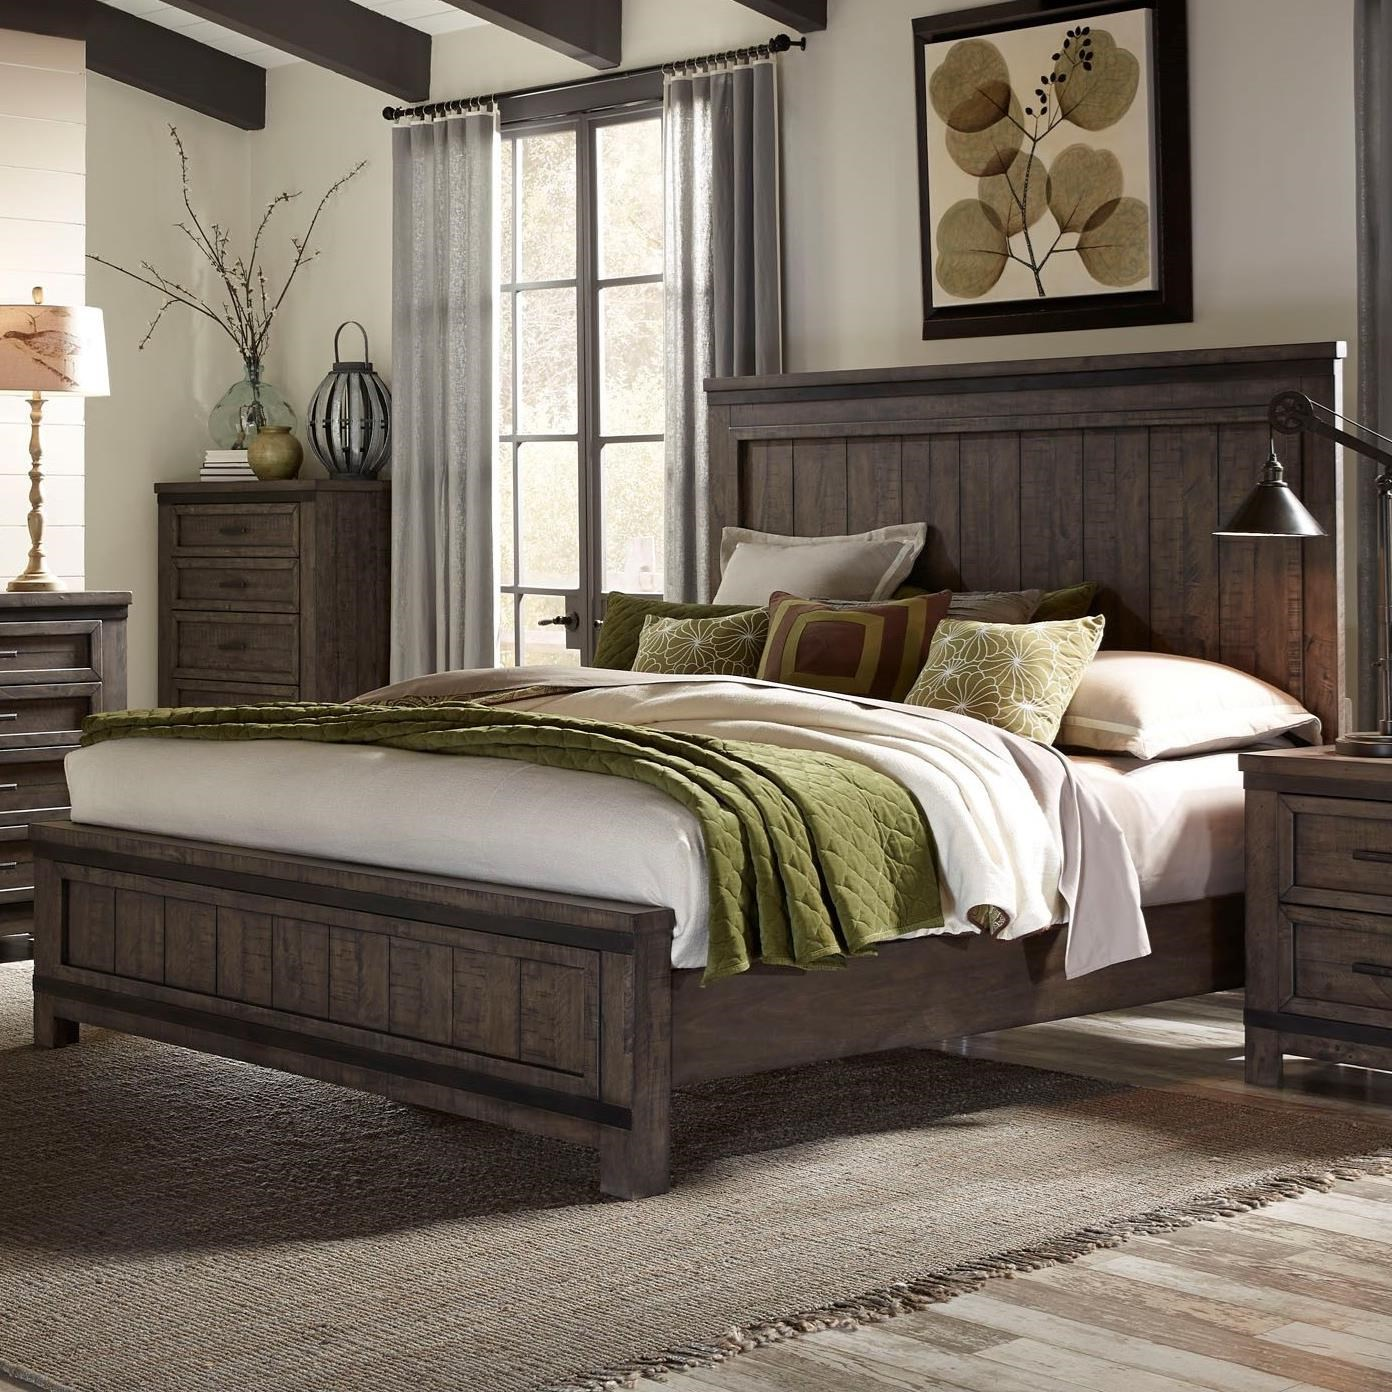 Liberty Furniture Thornwood Hills King Panel Bed - Item Number: 759-BR-KPB